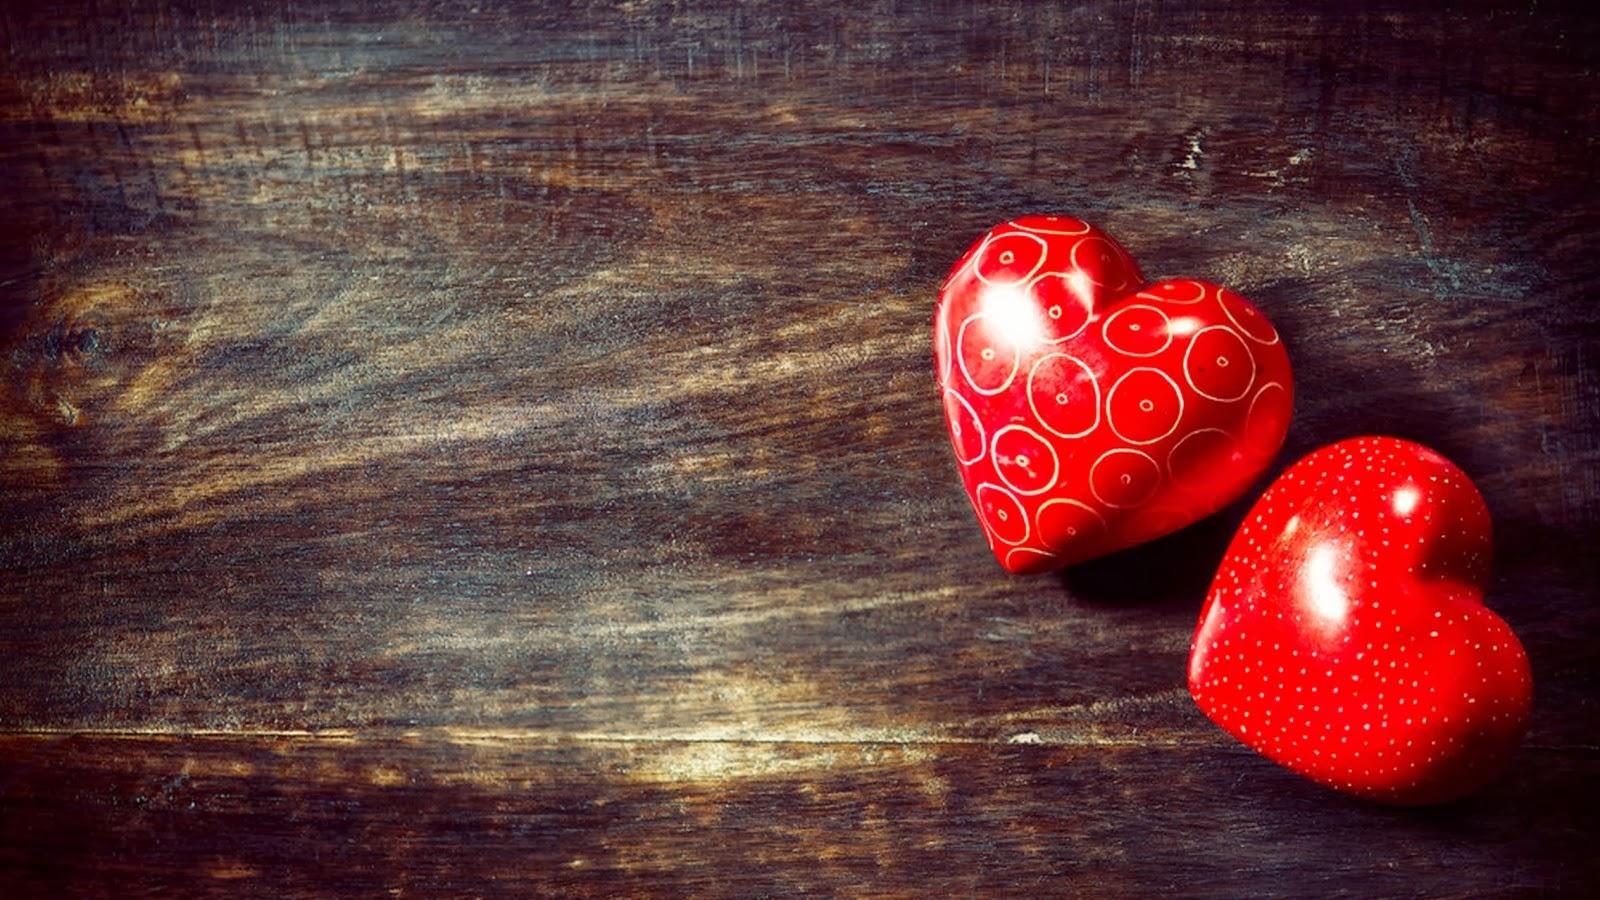 صوره اجمل صور قلوب حمراء